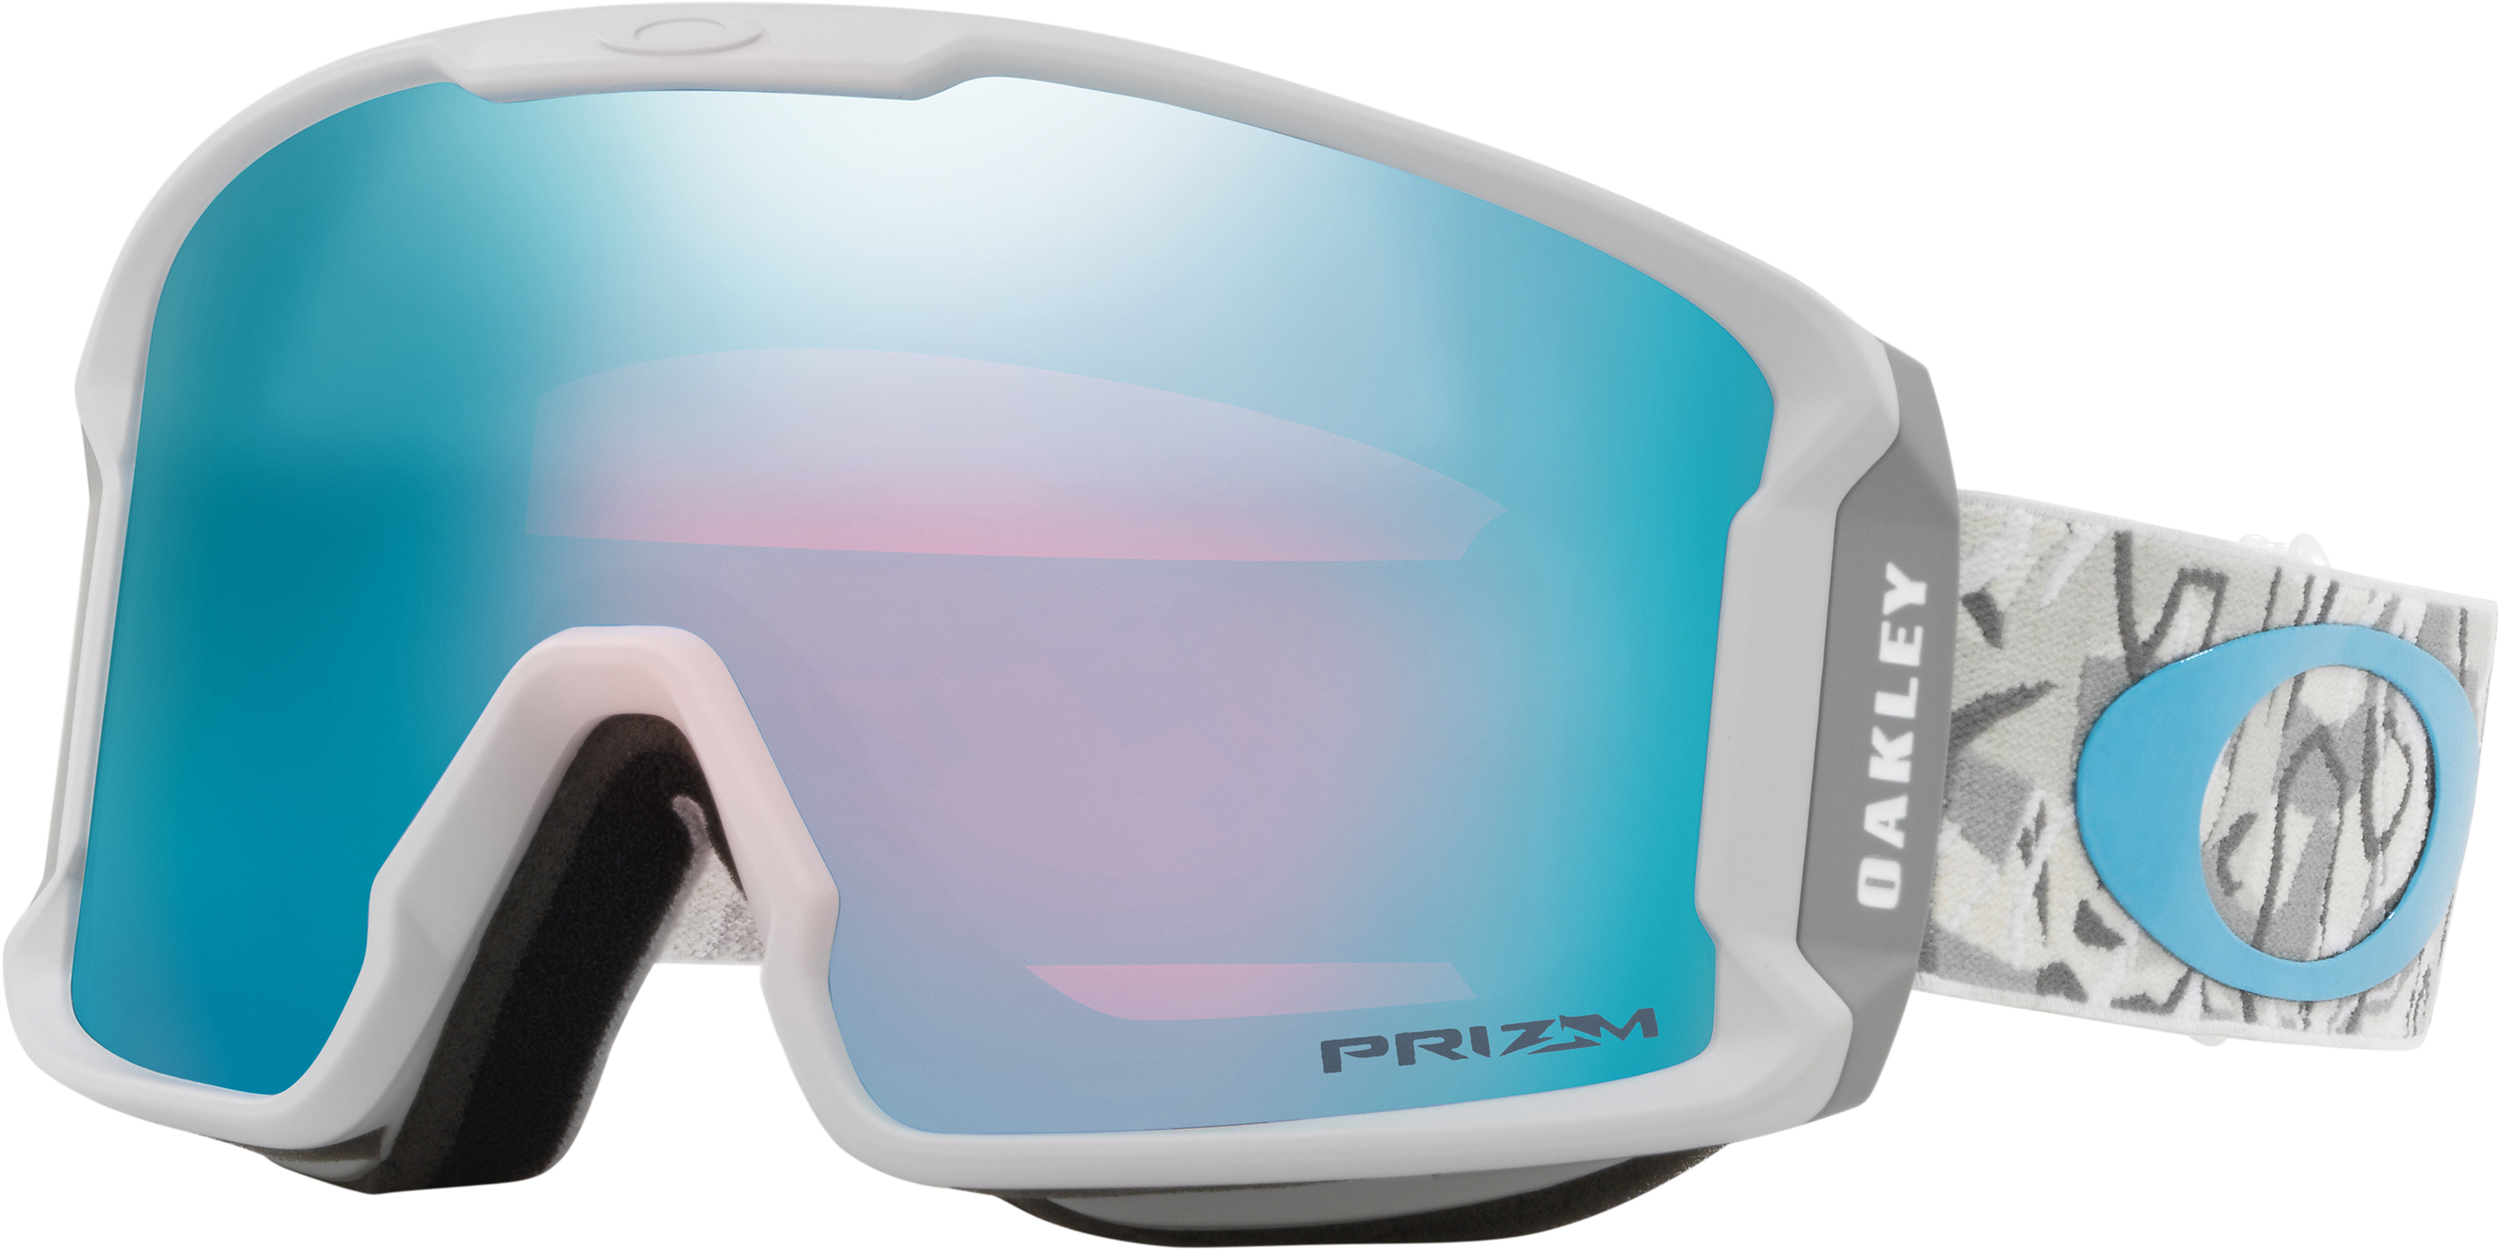 1f34adfe14ae Ski and snowboard goggles